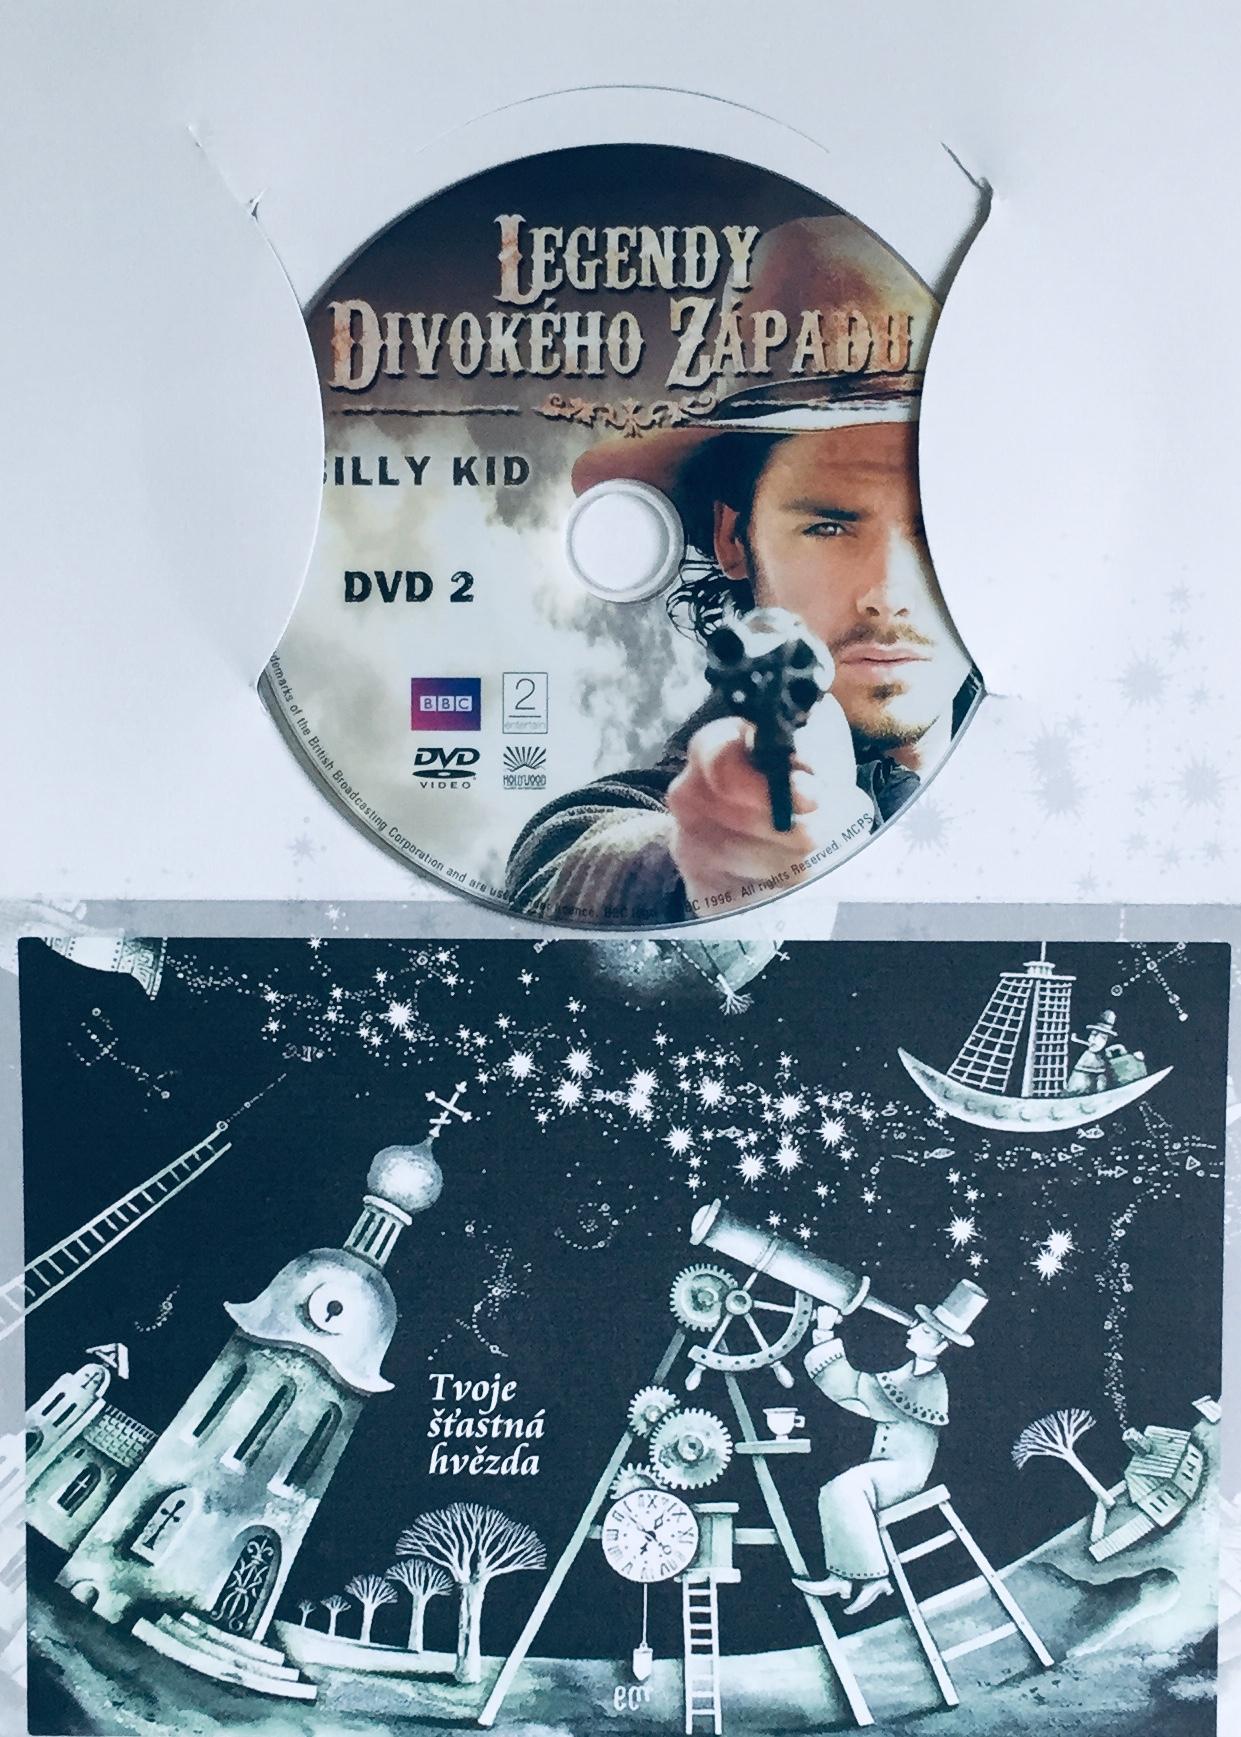 Legendy Divokého západu - Billy Kid - DVD 2 - DVD /dárkový obal/